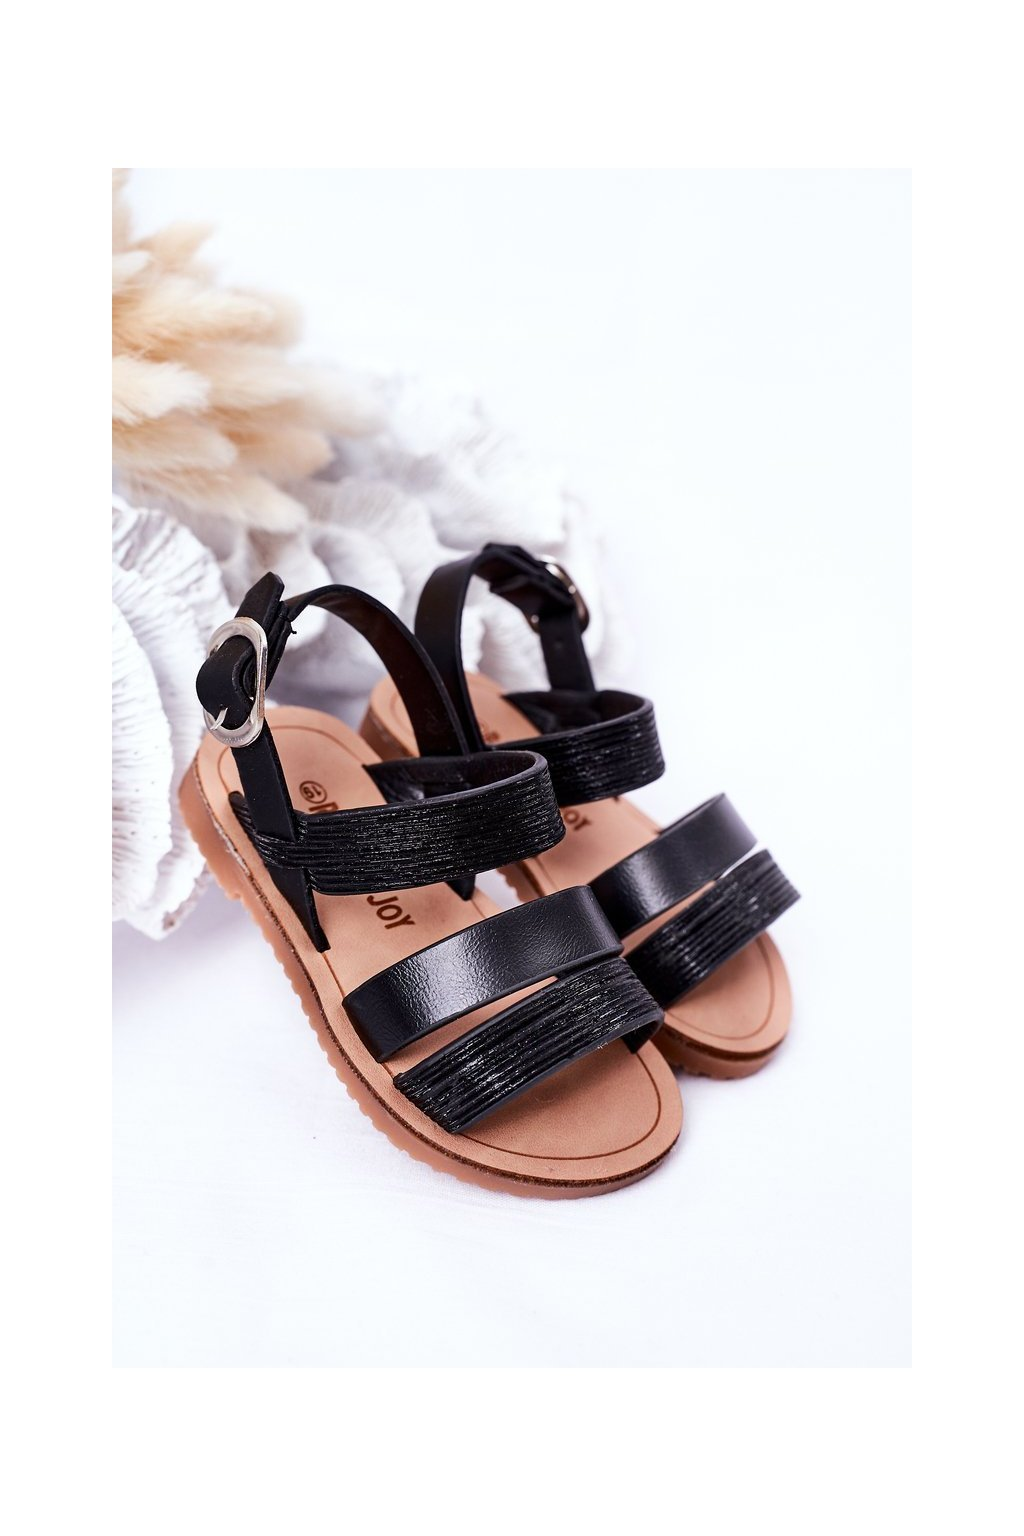 Detské sandále farba čierna NJSK 255-A BLACK